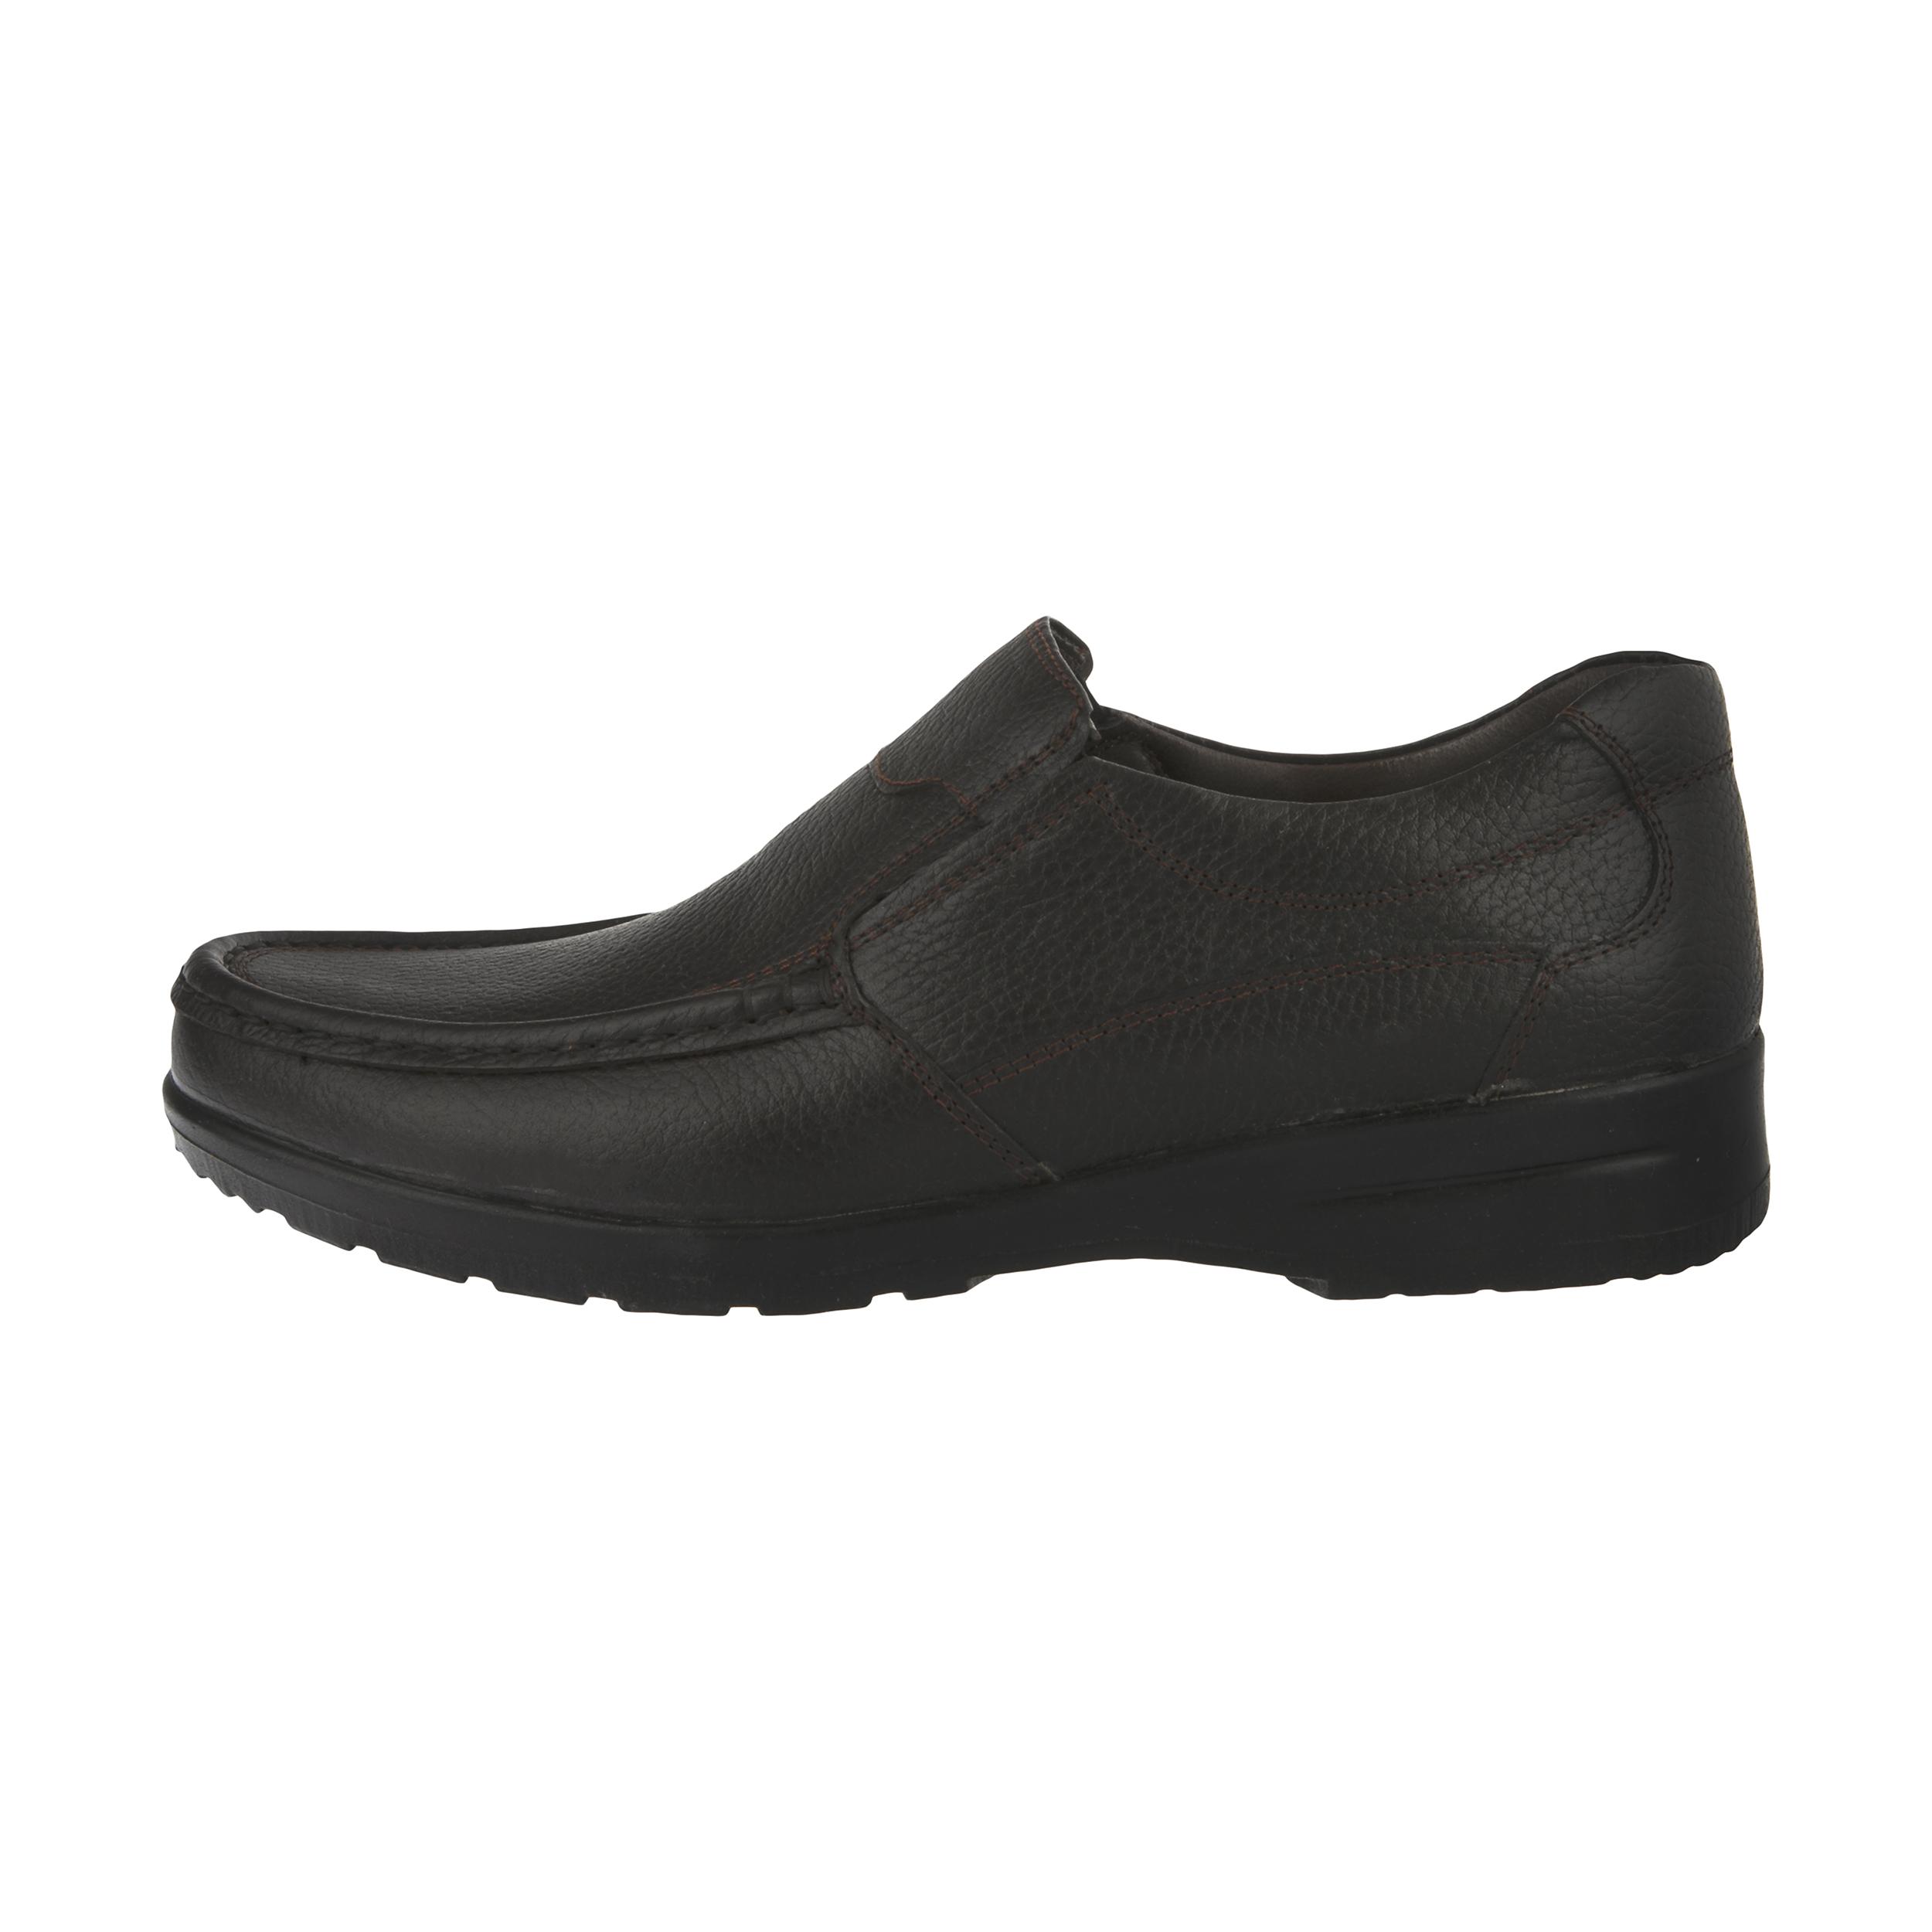 کفش روزمره مردانه دلفارد مدل 7m01a503146